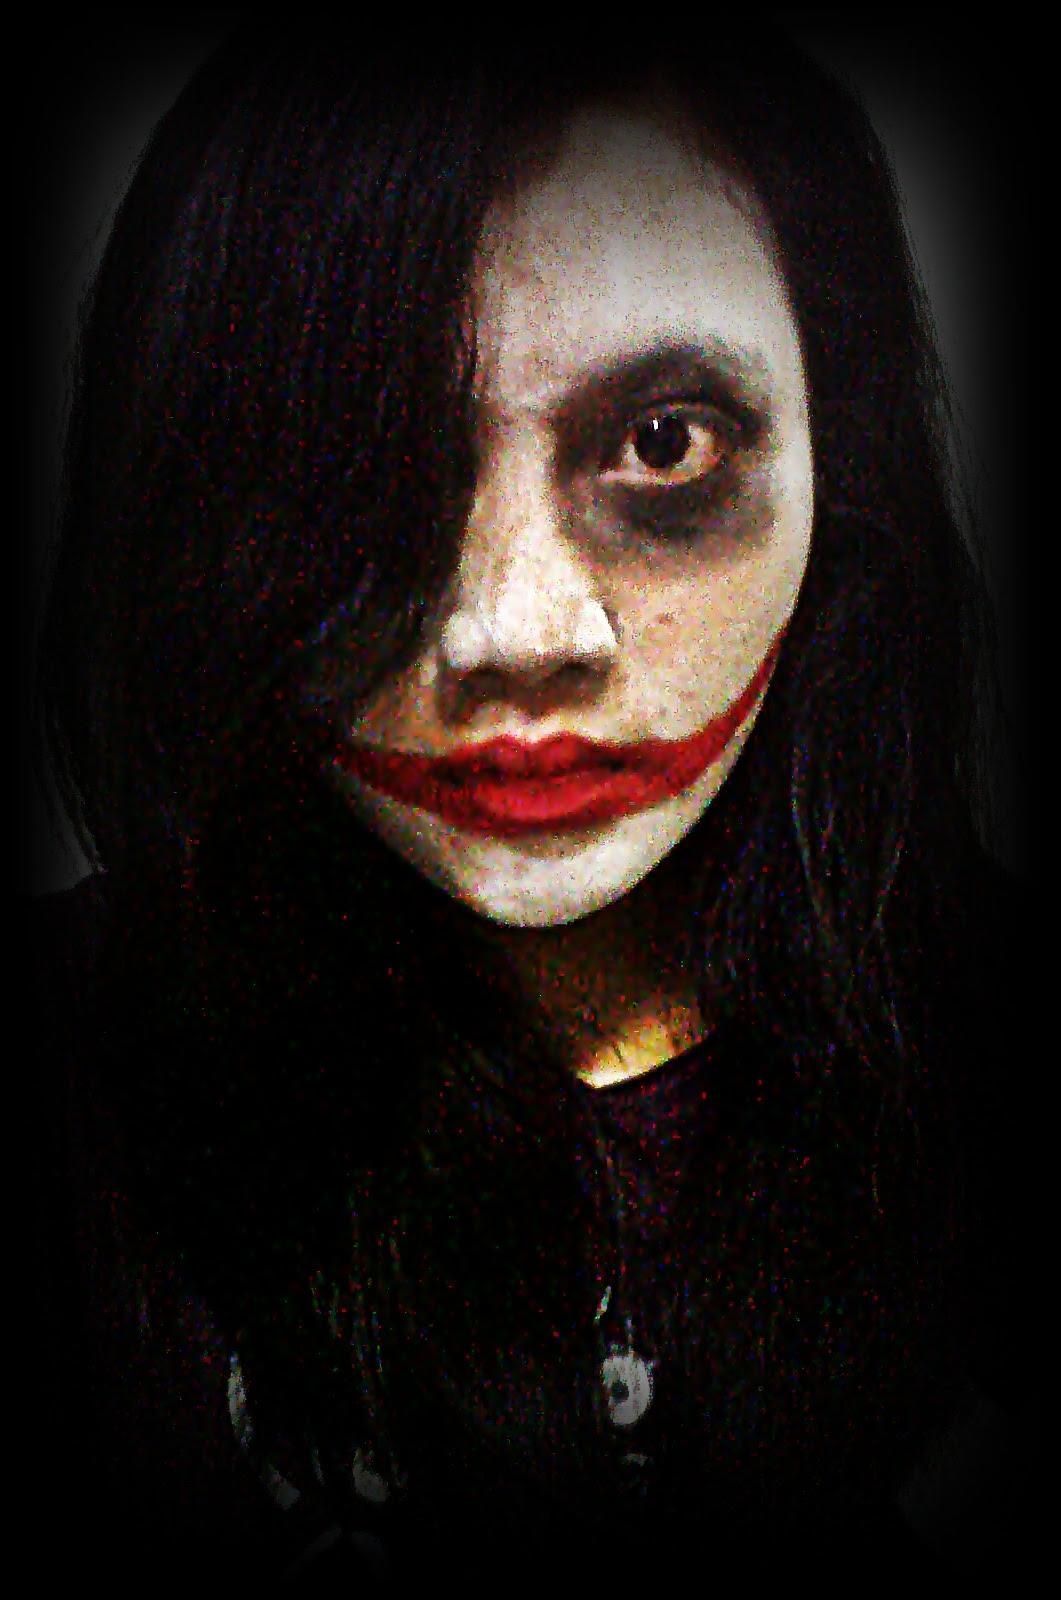 Why so serious? - The Joker Photo (34260088) - Fanpop